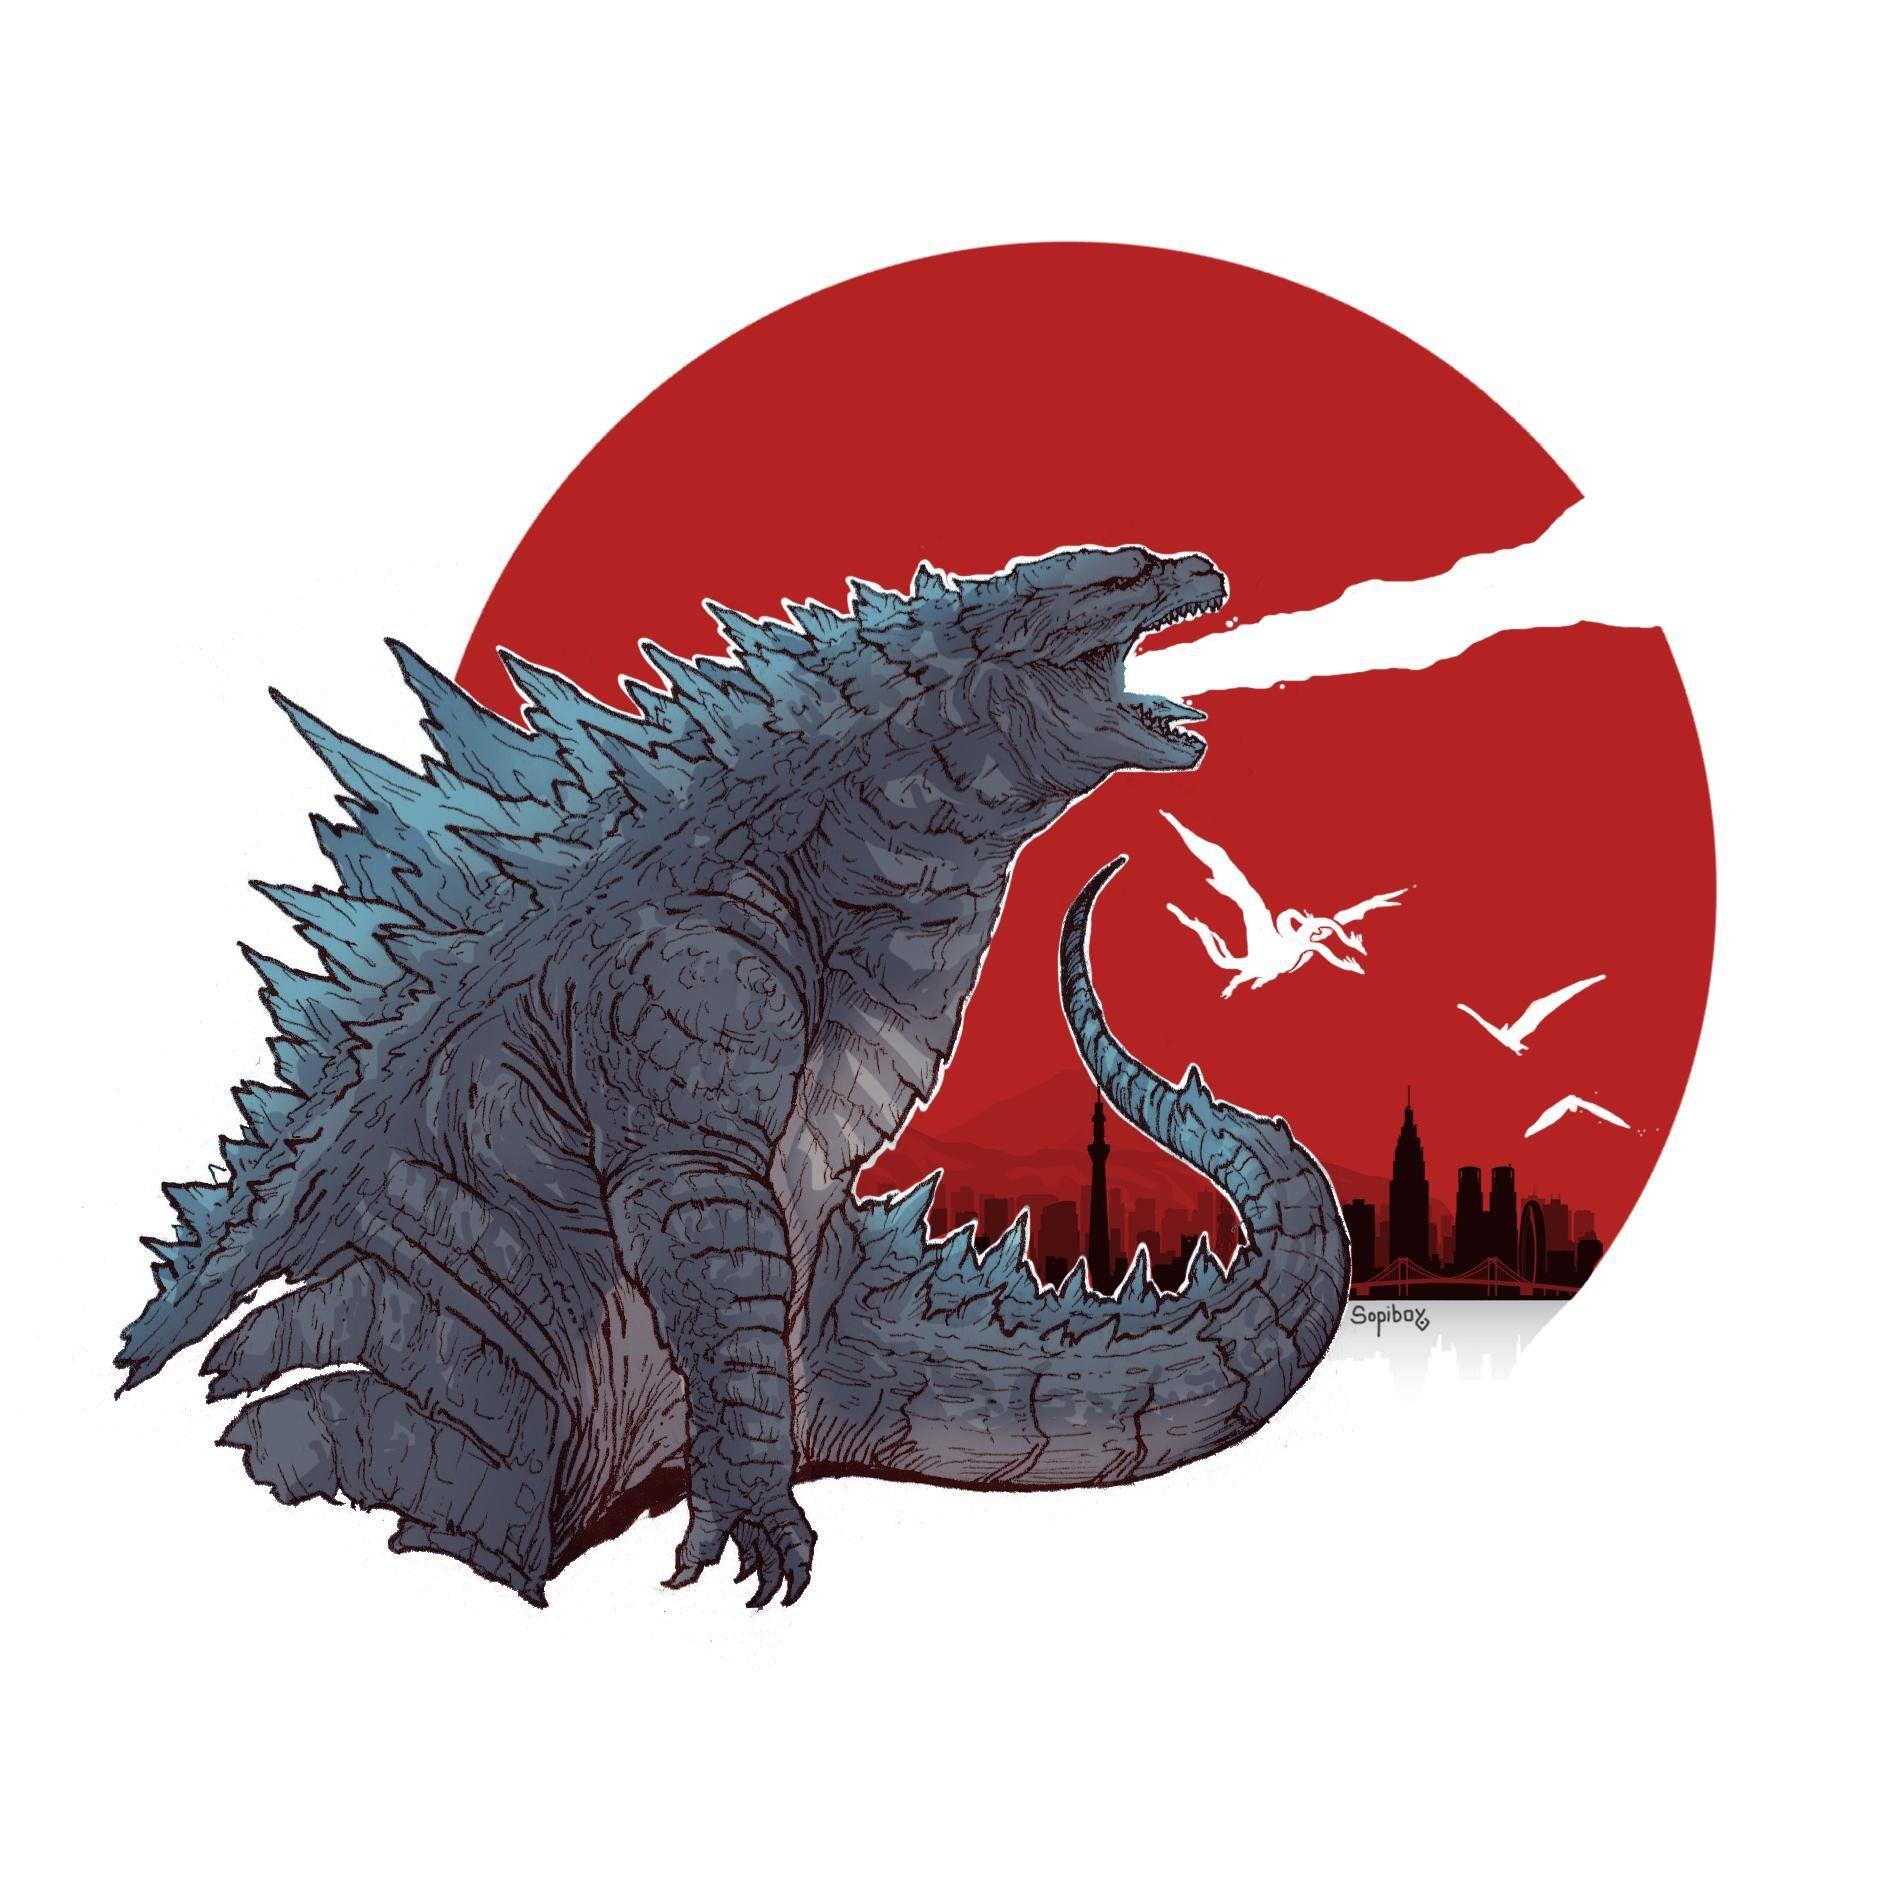 Godzilla 2 Imax Poster Textless: Godzilla By JeanBaptiste Roux Godzilla In 2019 Godzilla Movie